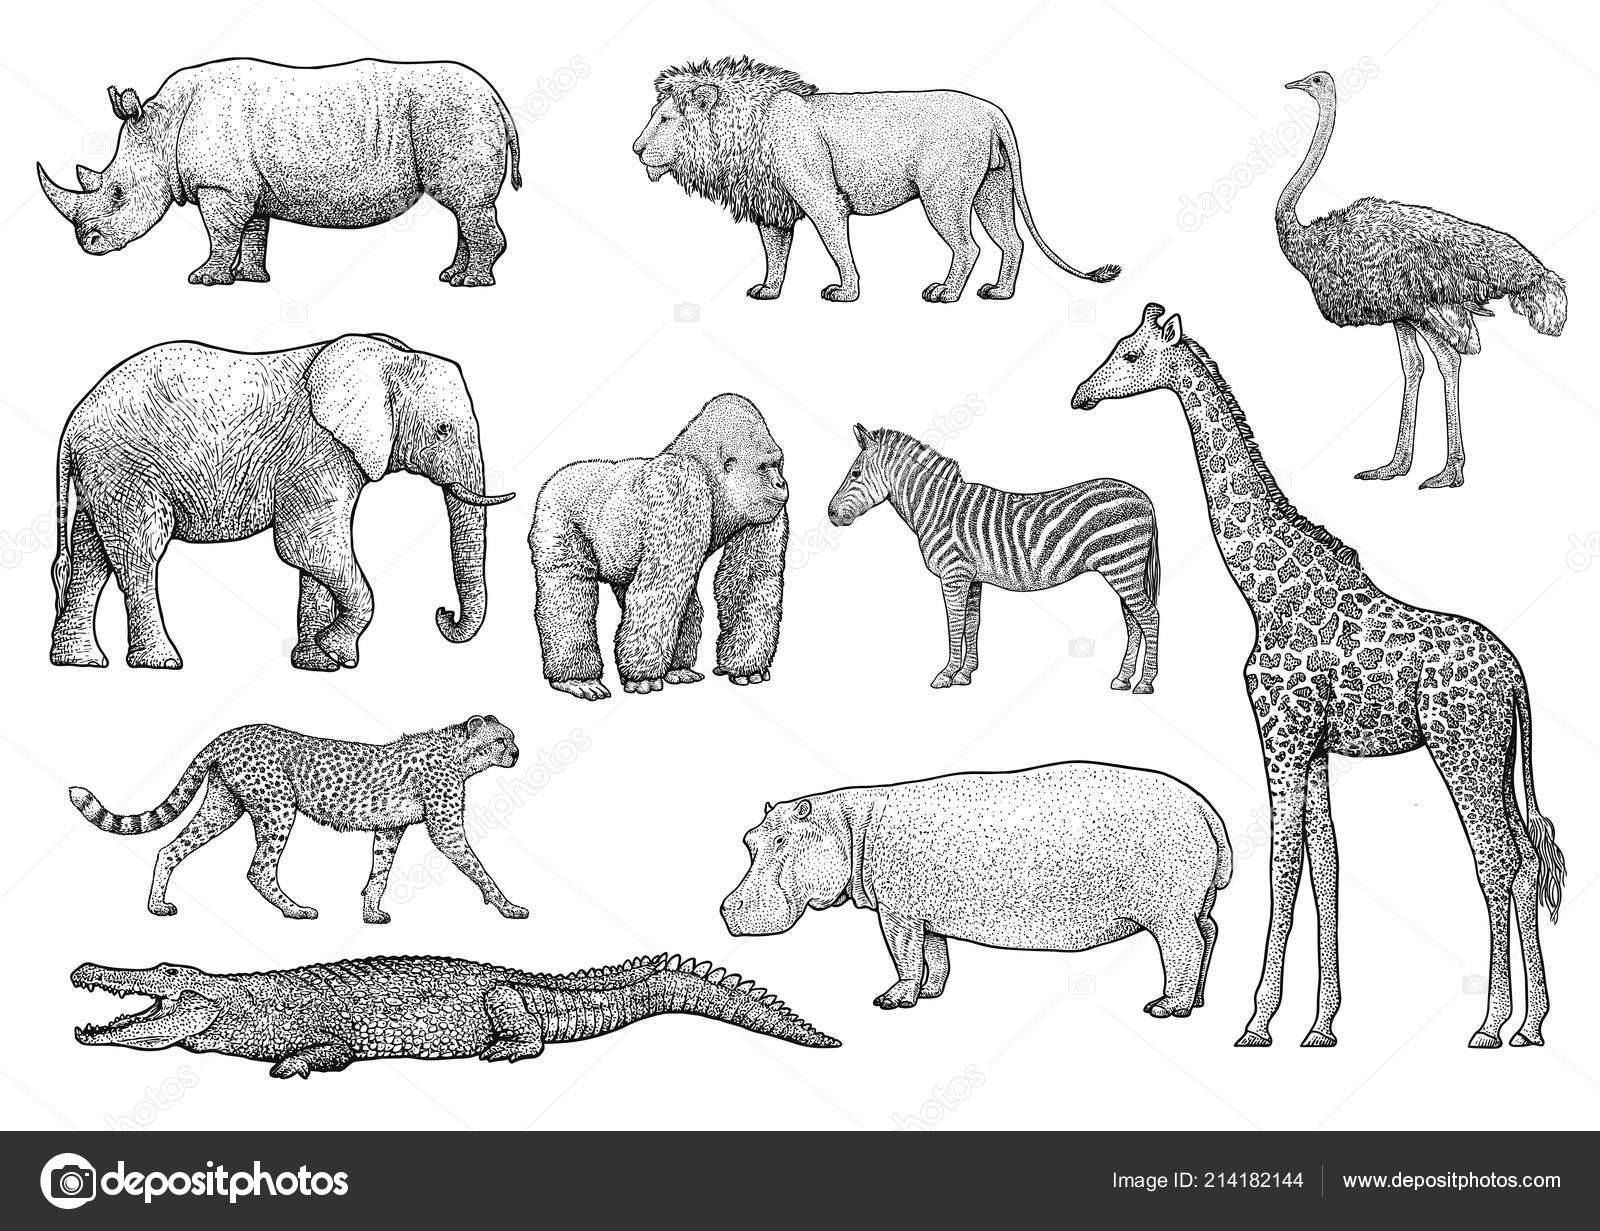 Africka Zvirata Ilustrace Kresba Gravirovani Inkoust Perokresby